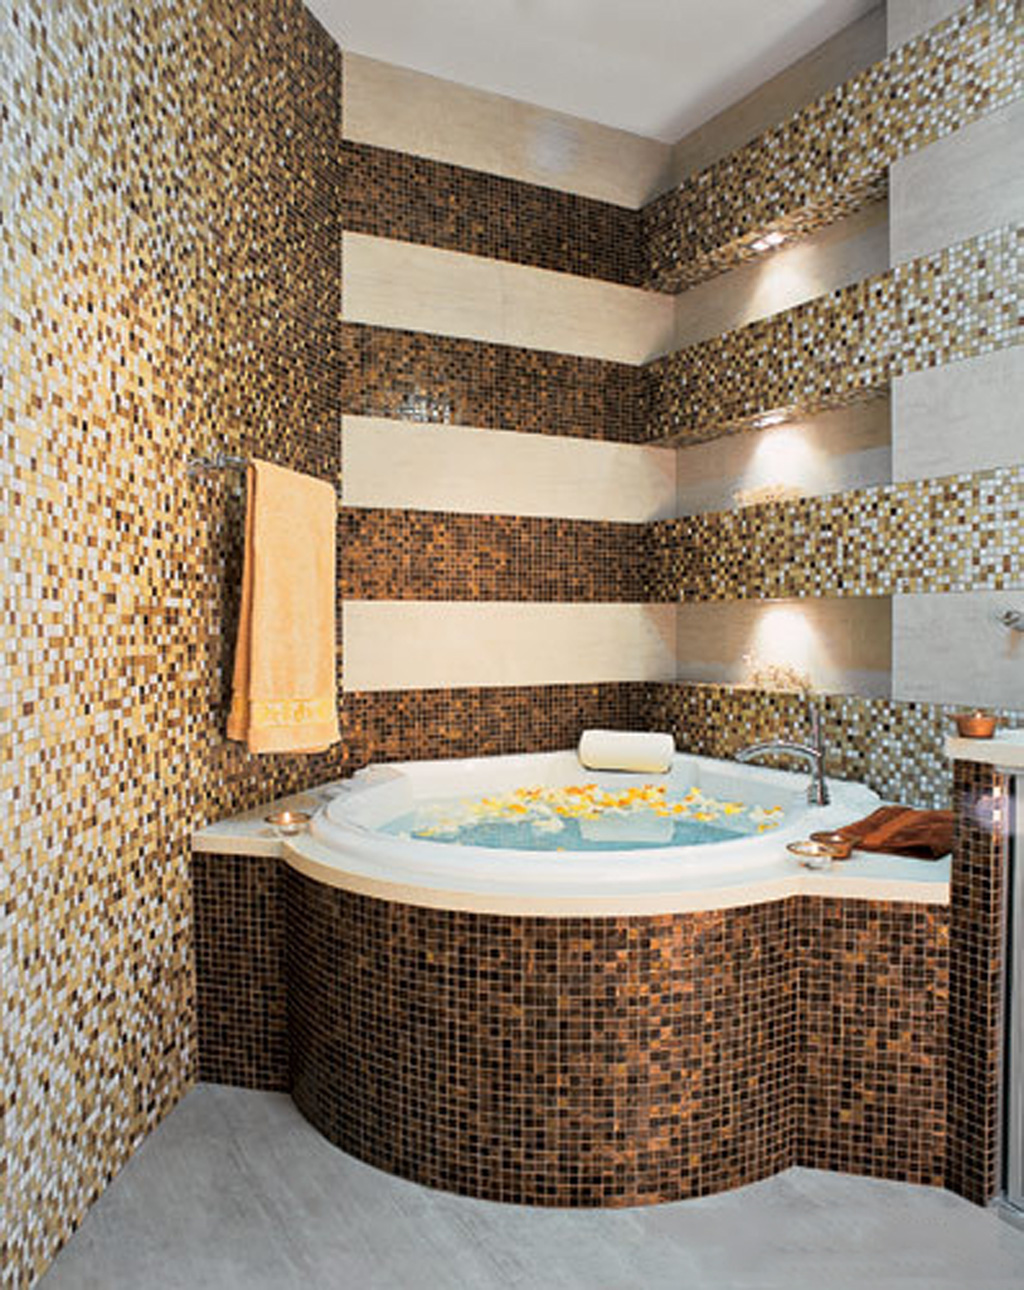 Дизайн санузла из мозаики фото